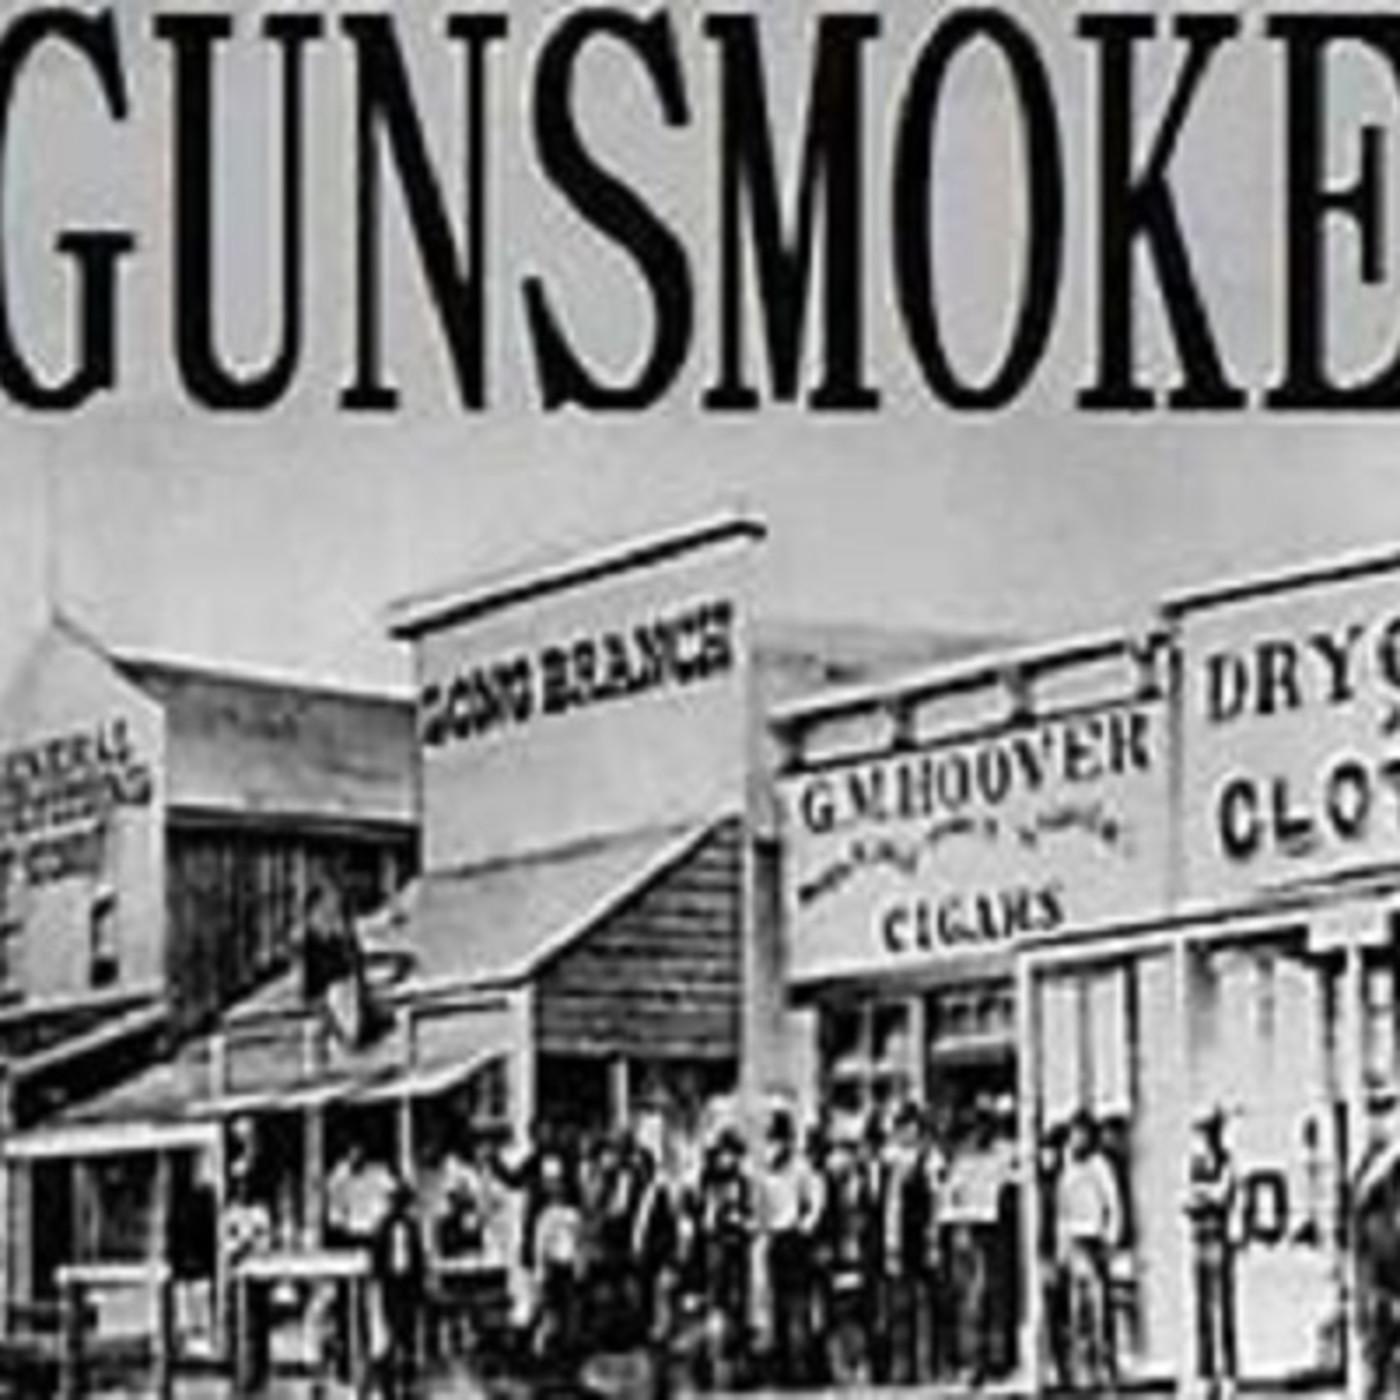 Gunsmoke 61-04-16 (471) Cooter